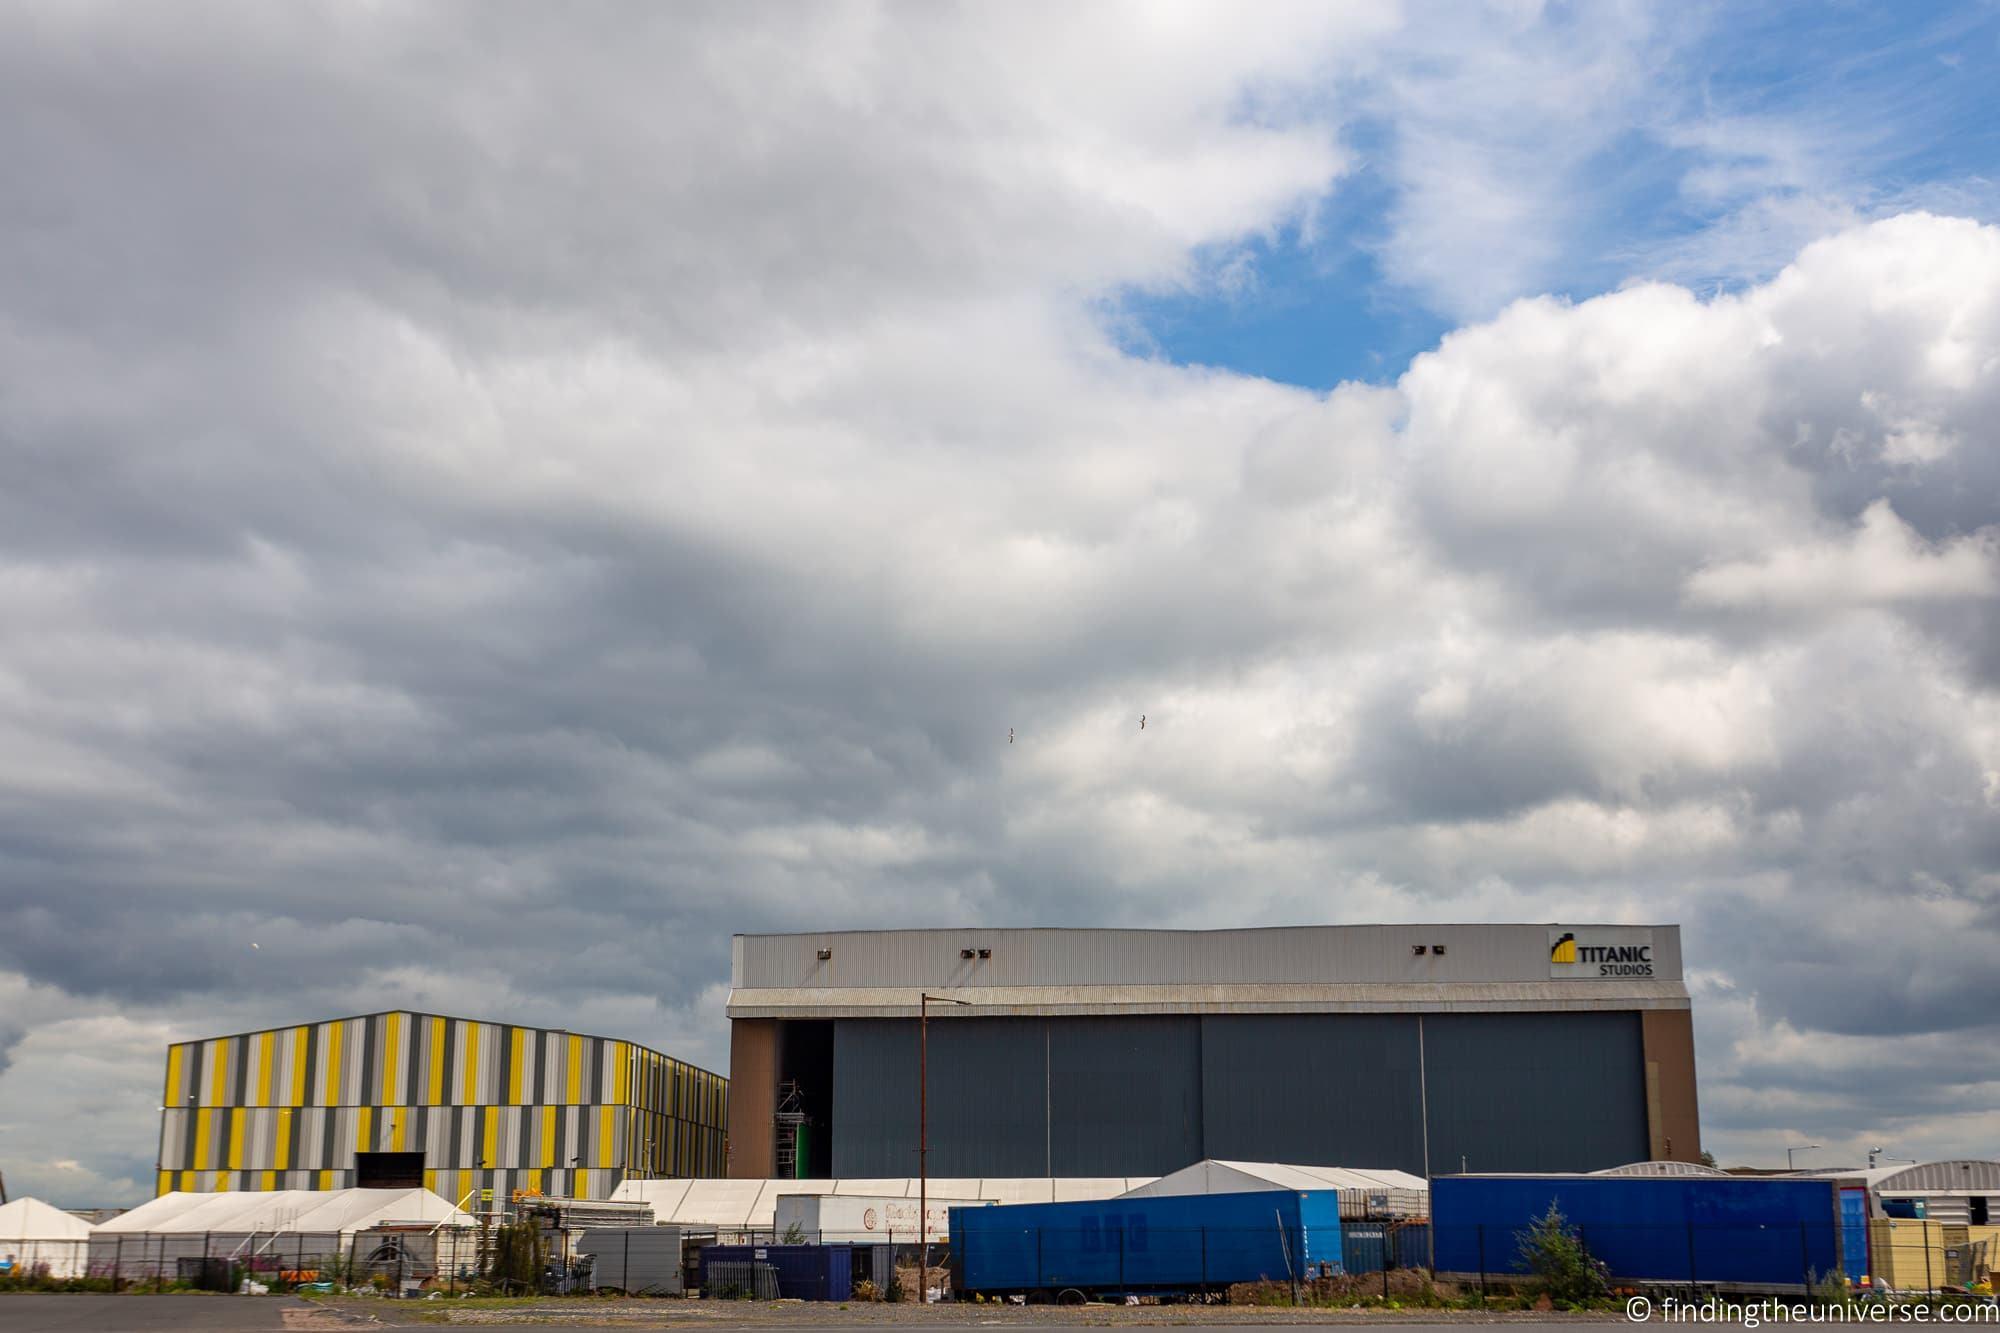 Titanic Studios Belfast